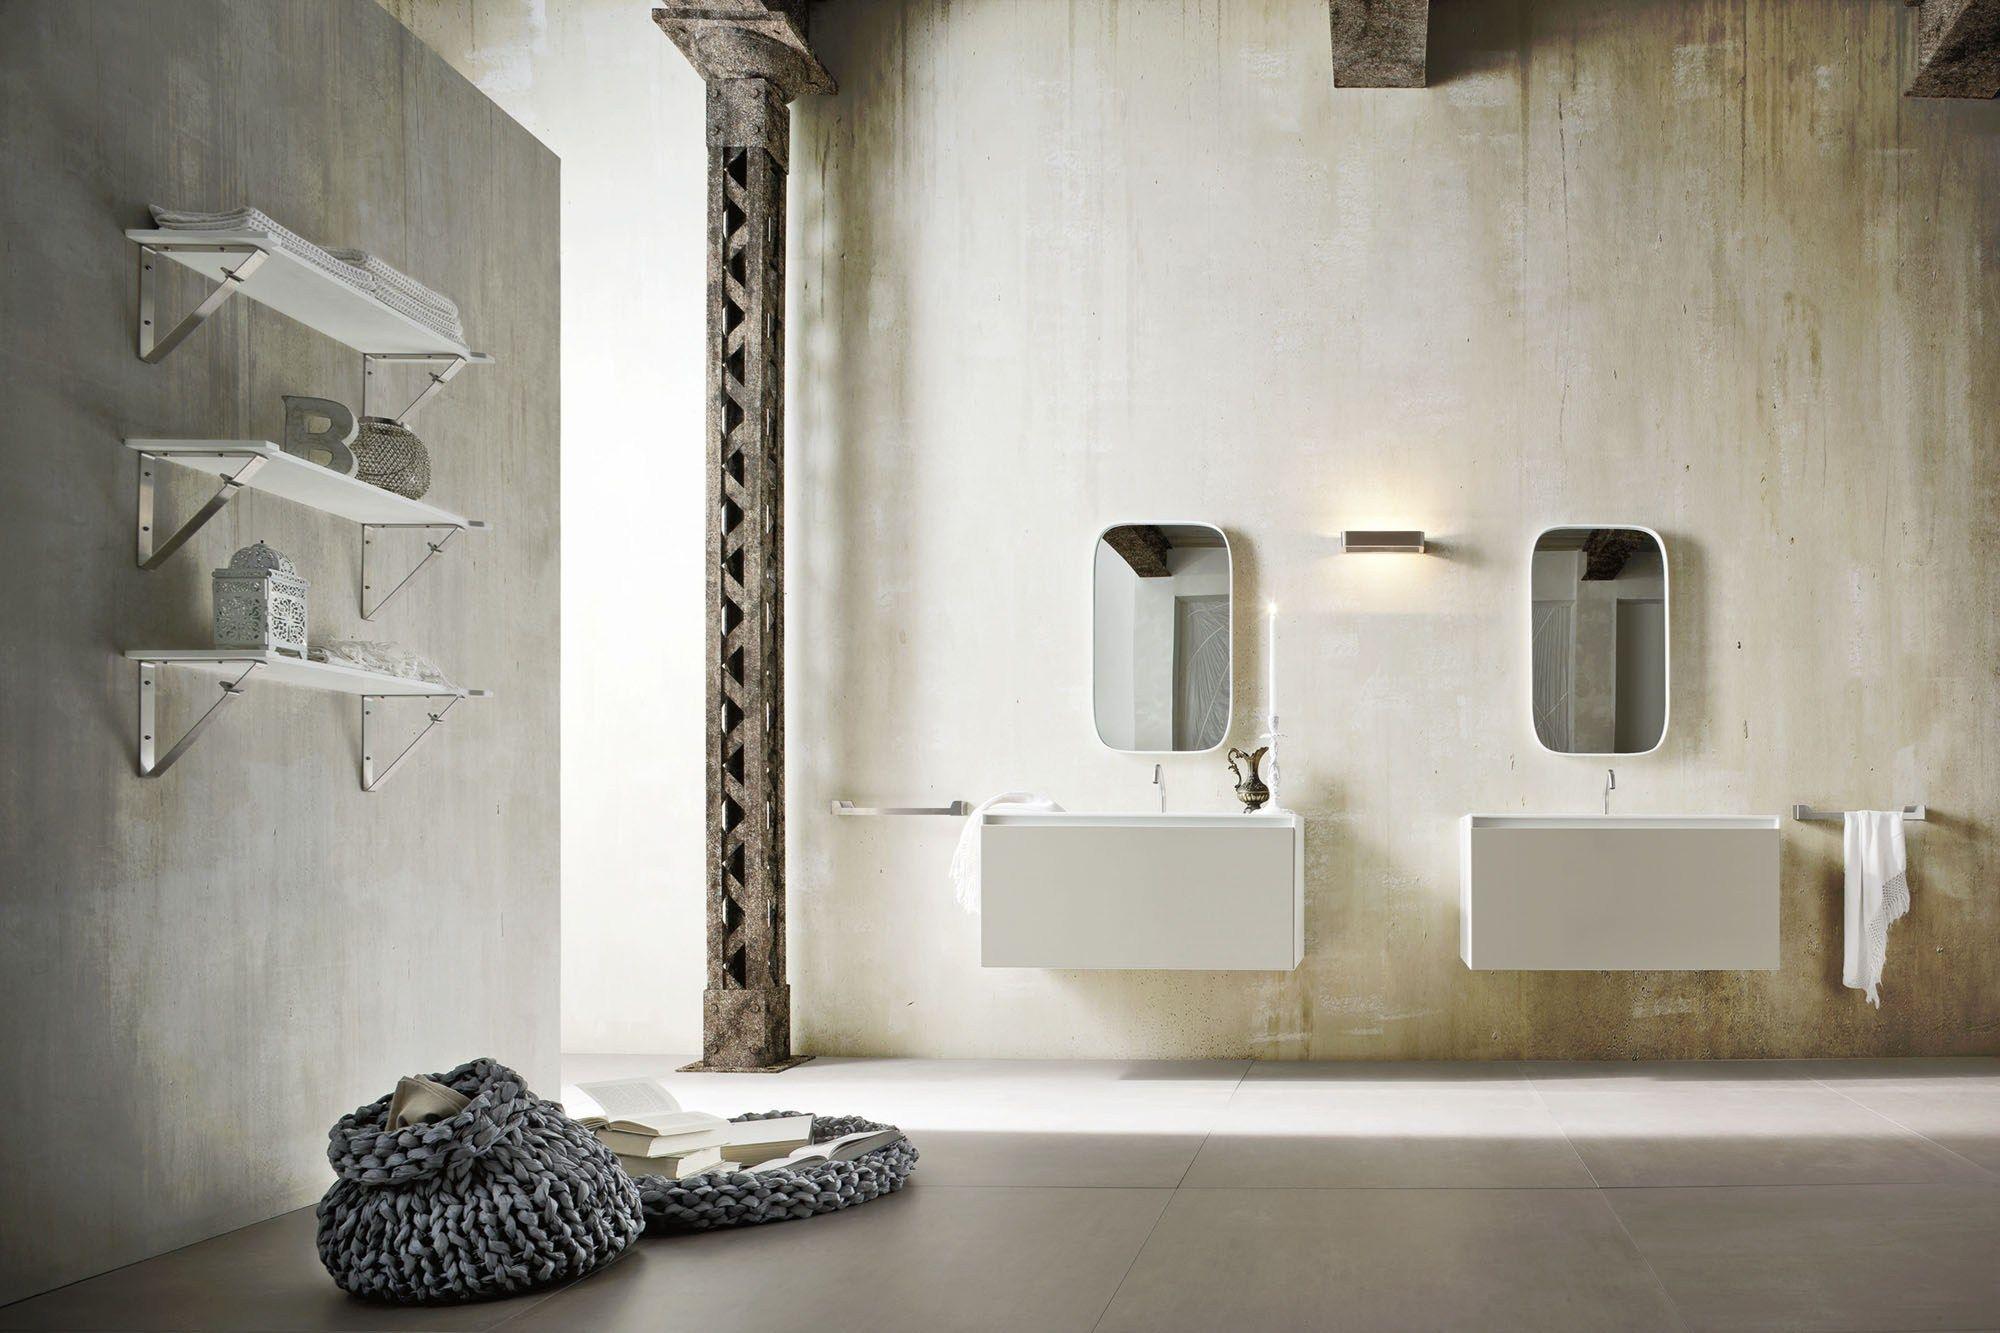 Ergo nomic single vanity unit by rexa design design giulio for Badezimmer corian